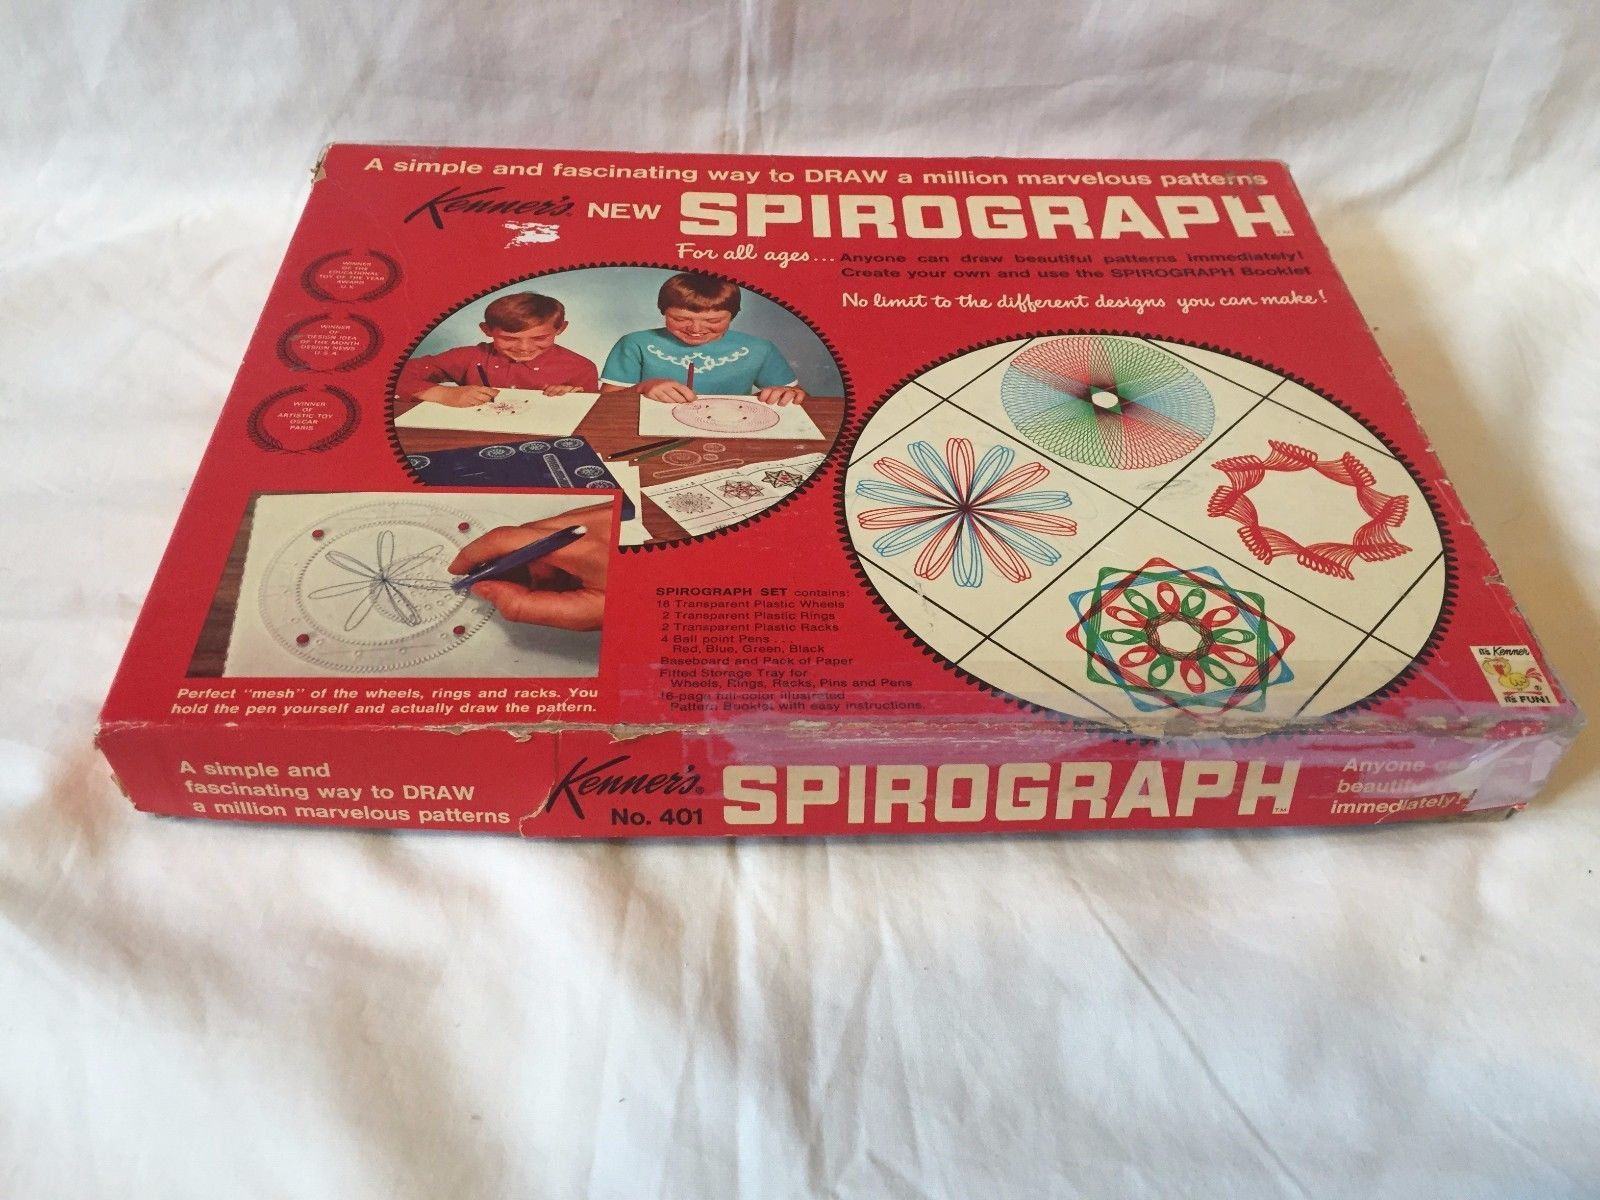 YuVtg Spirograph Kenner's Drawing Set